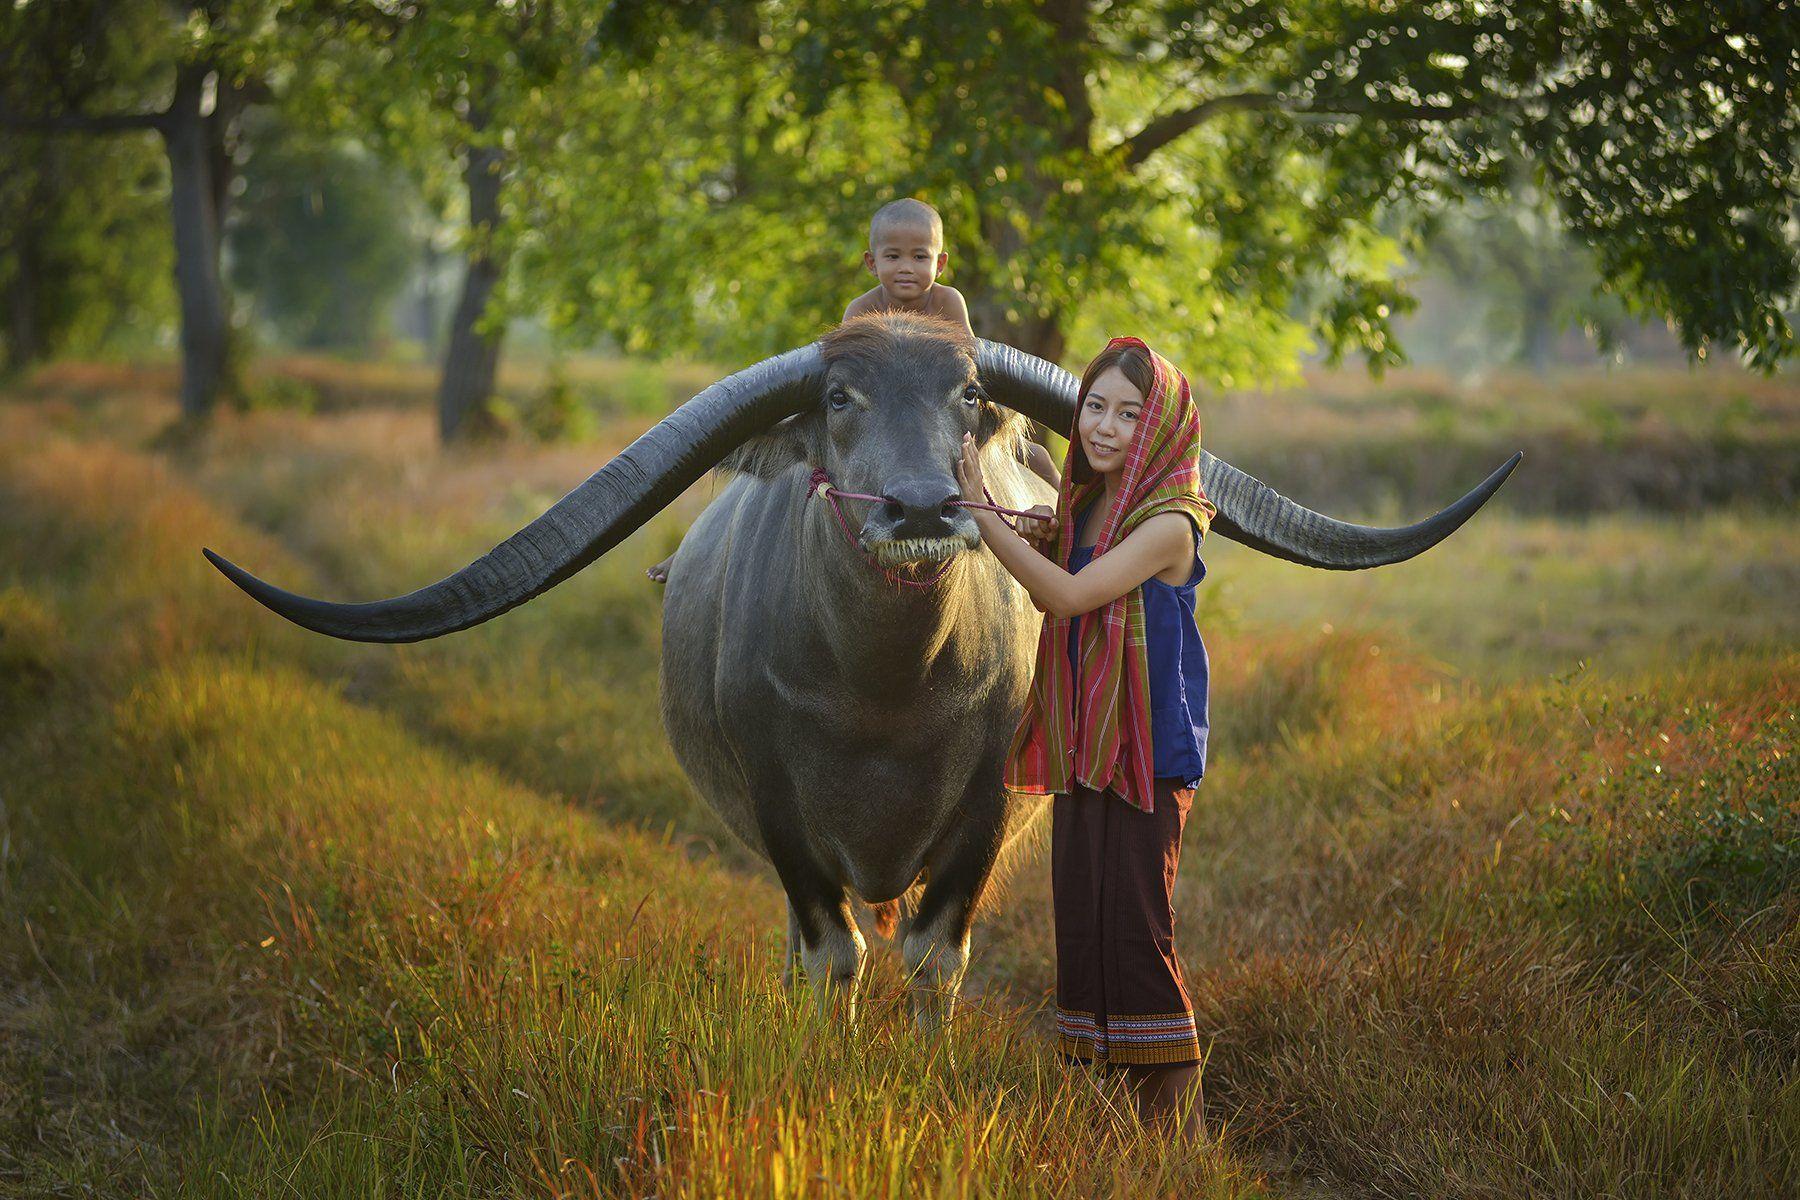 Asia, Asian, Beauty, Buffalo, Child, Children, China, Field, People, Sunlight, Sunrise, Sunset, Thailand, Woman, Saravut Whanset